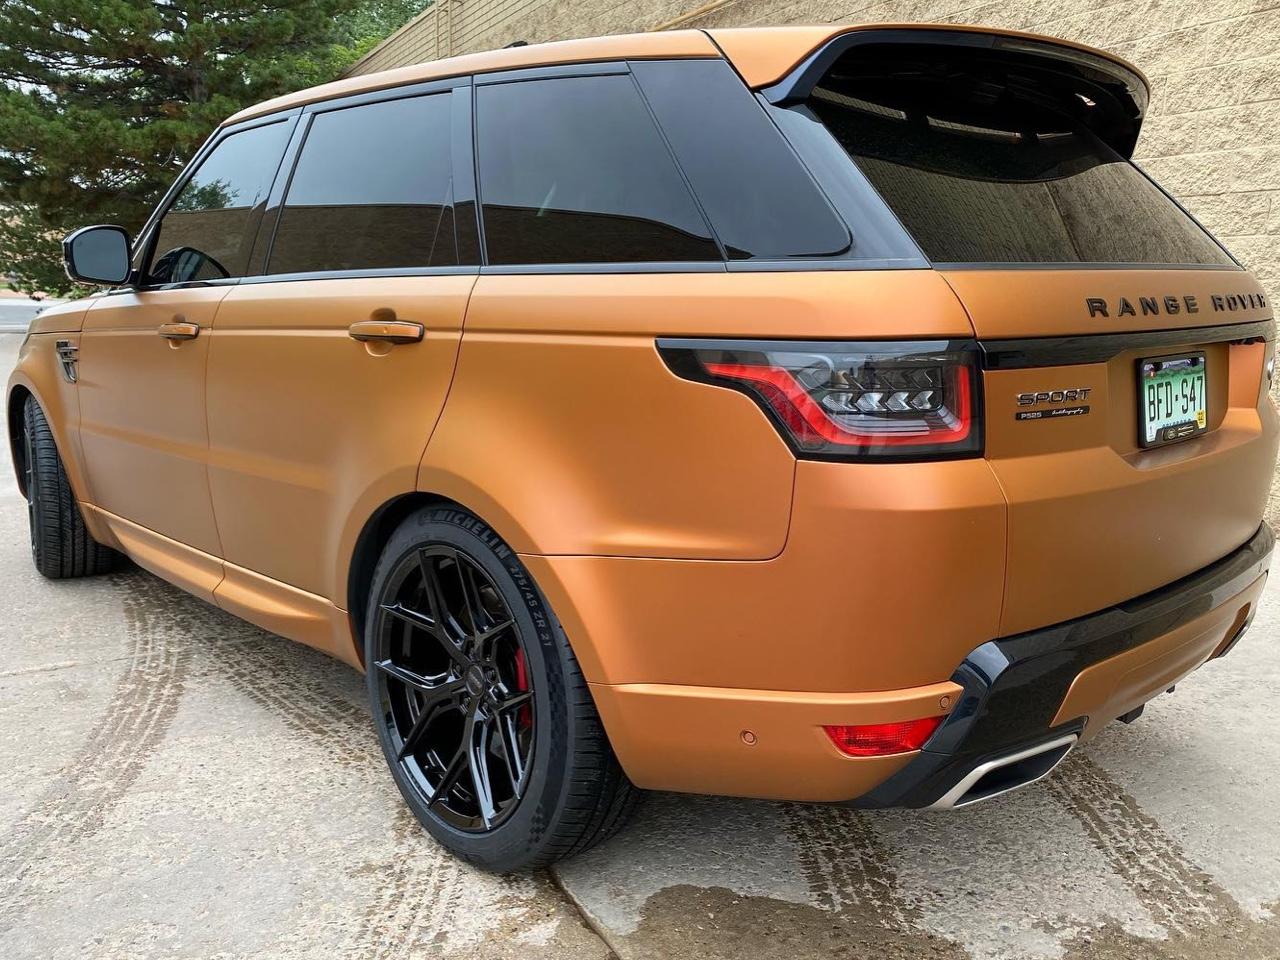 Range Rover Sport tinted windows